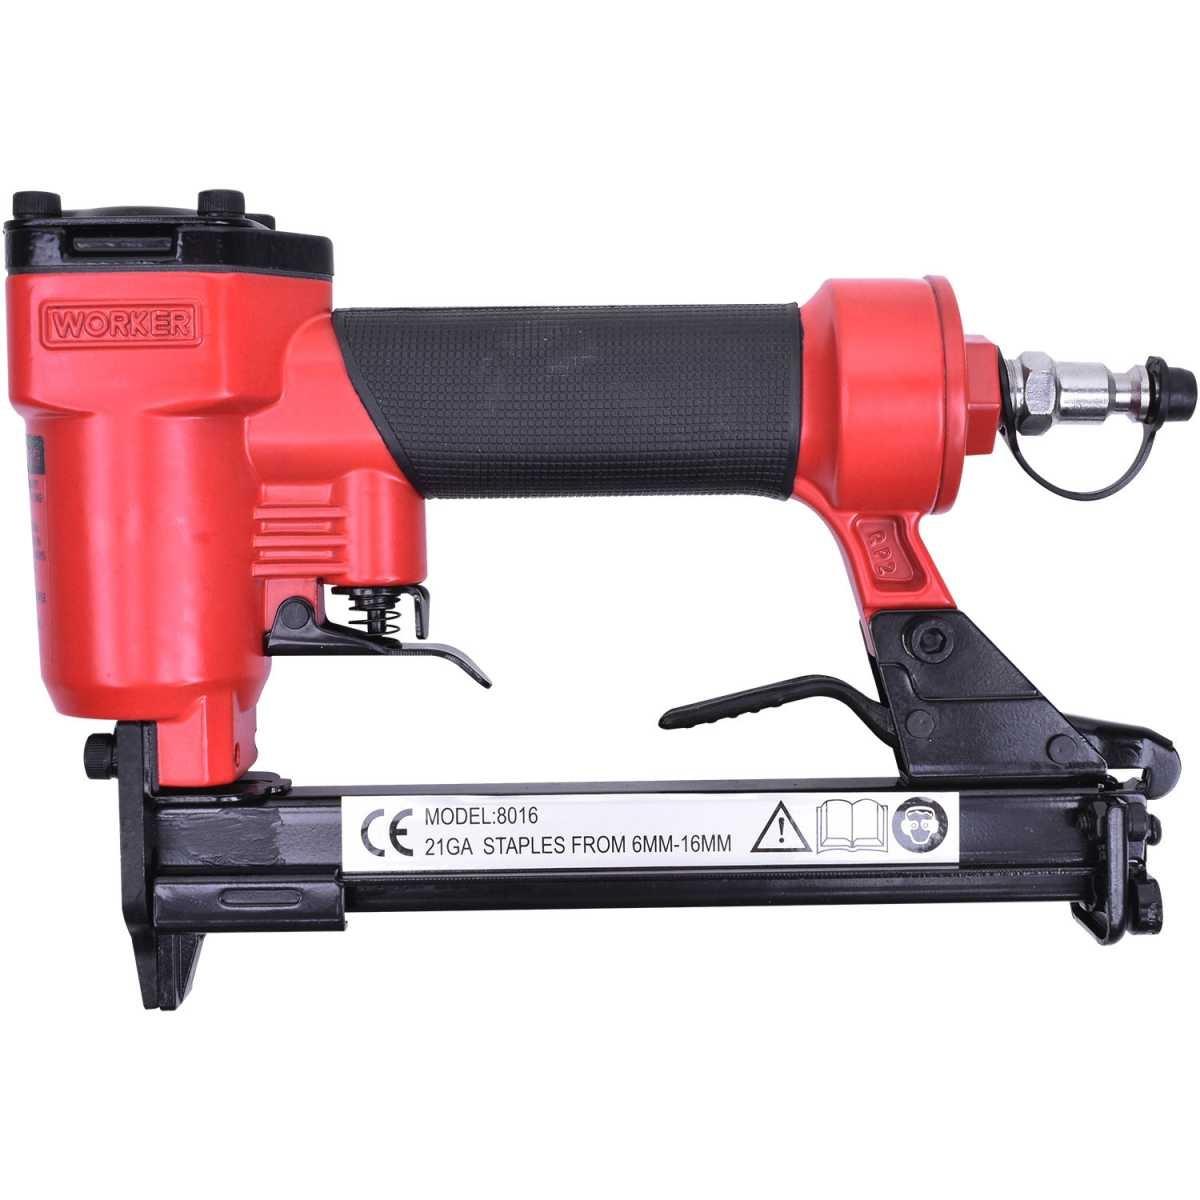 Grampeador Pneumático Worker 6 A 16mm 120 Grampos